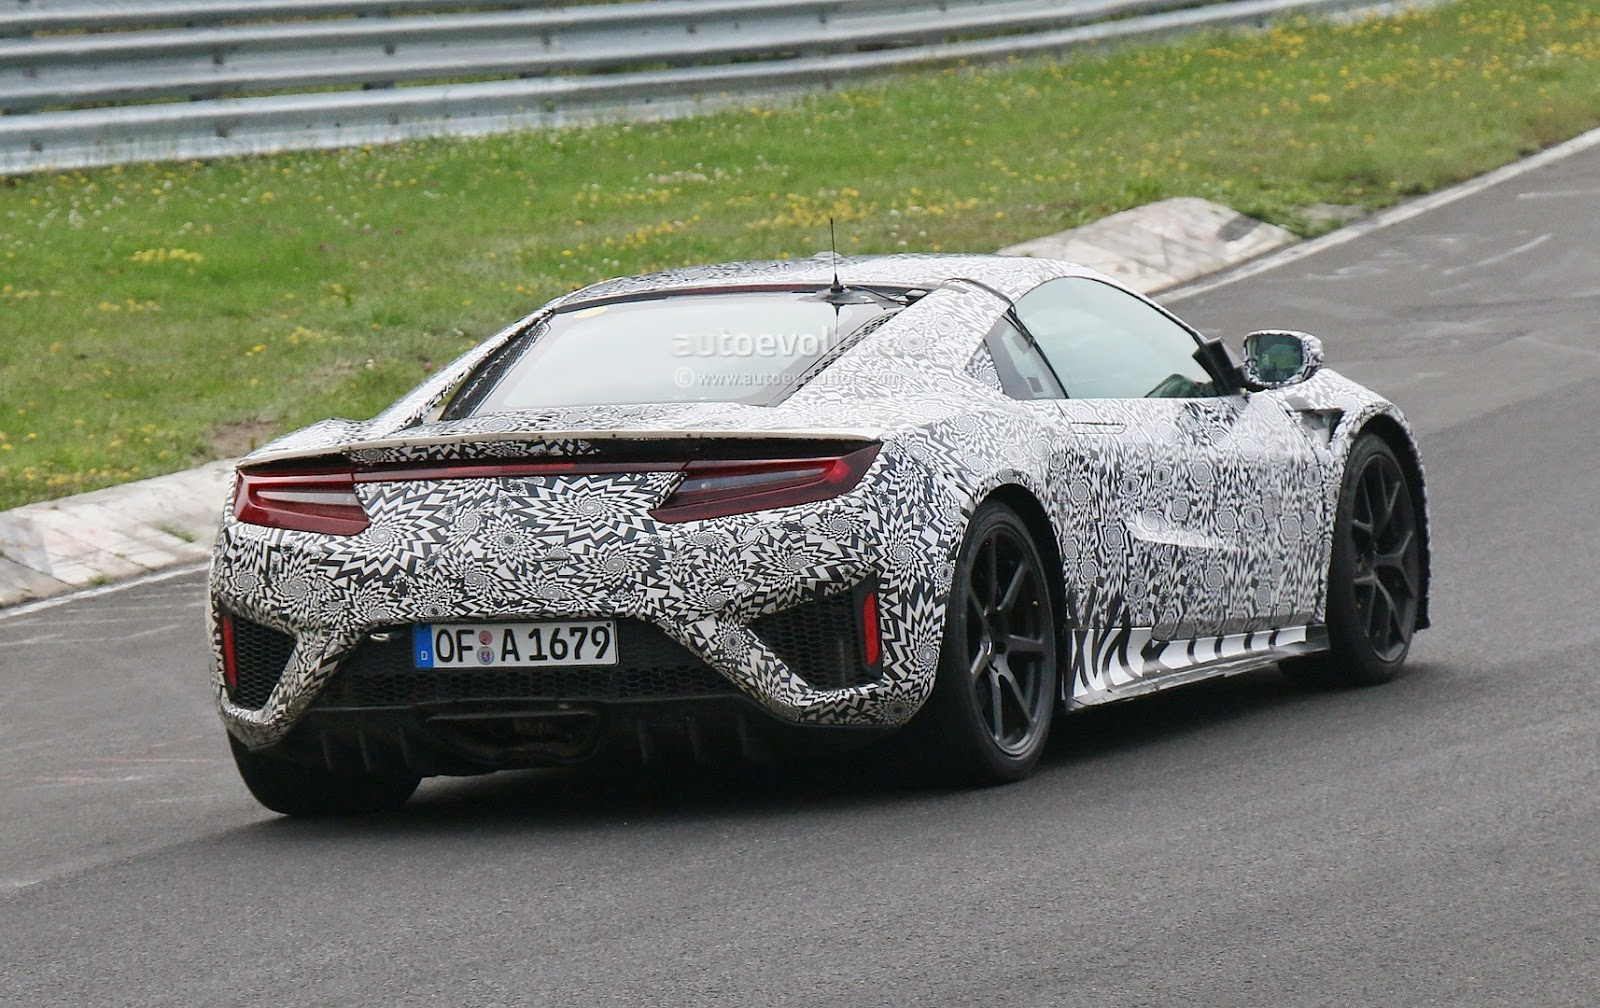 Pizo: 2015 Honda NSX Spotted via Nurburgring